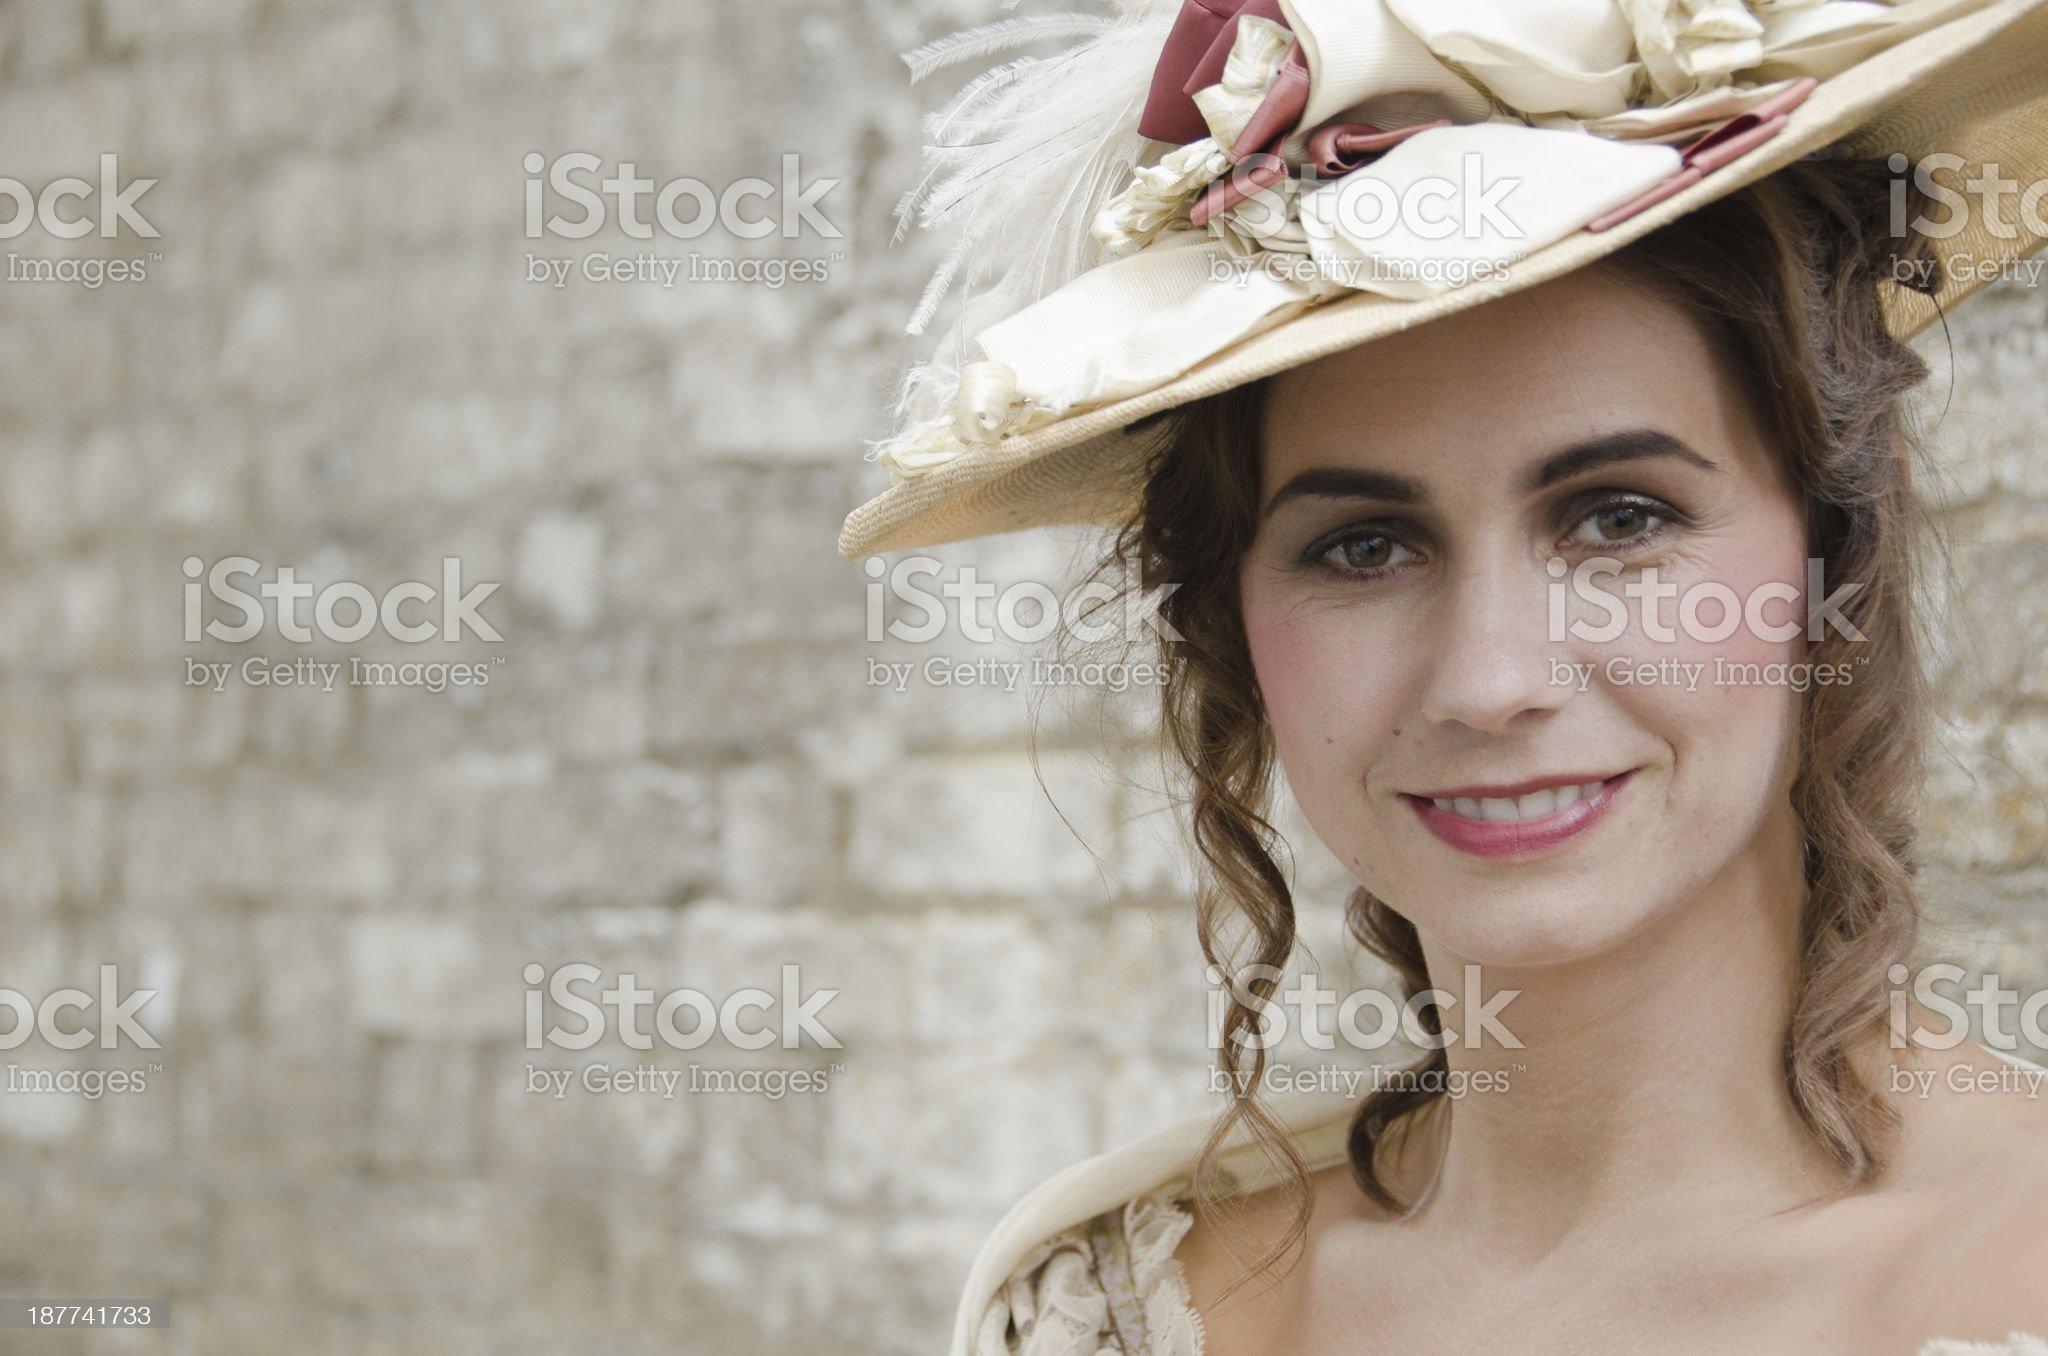 Victorian Woman Portrait royalty-free stock photo